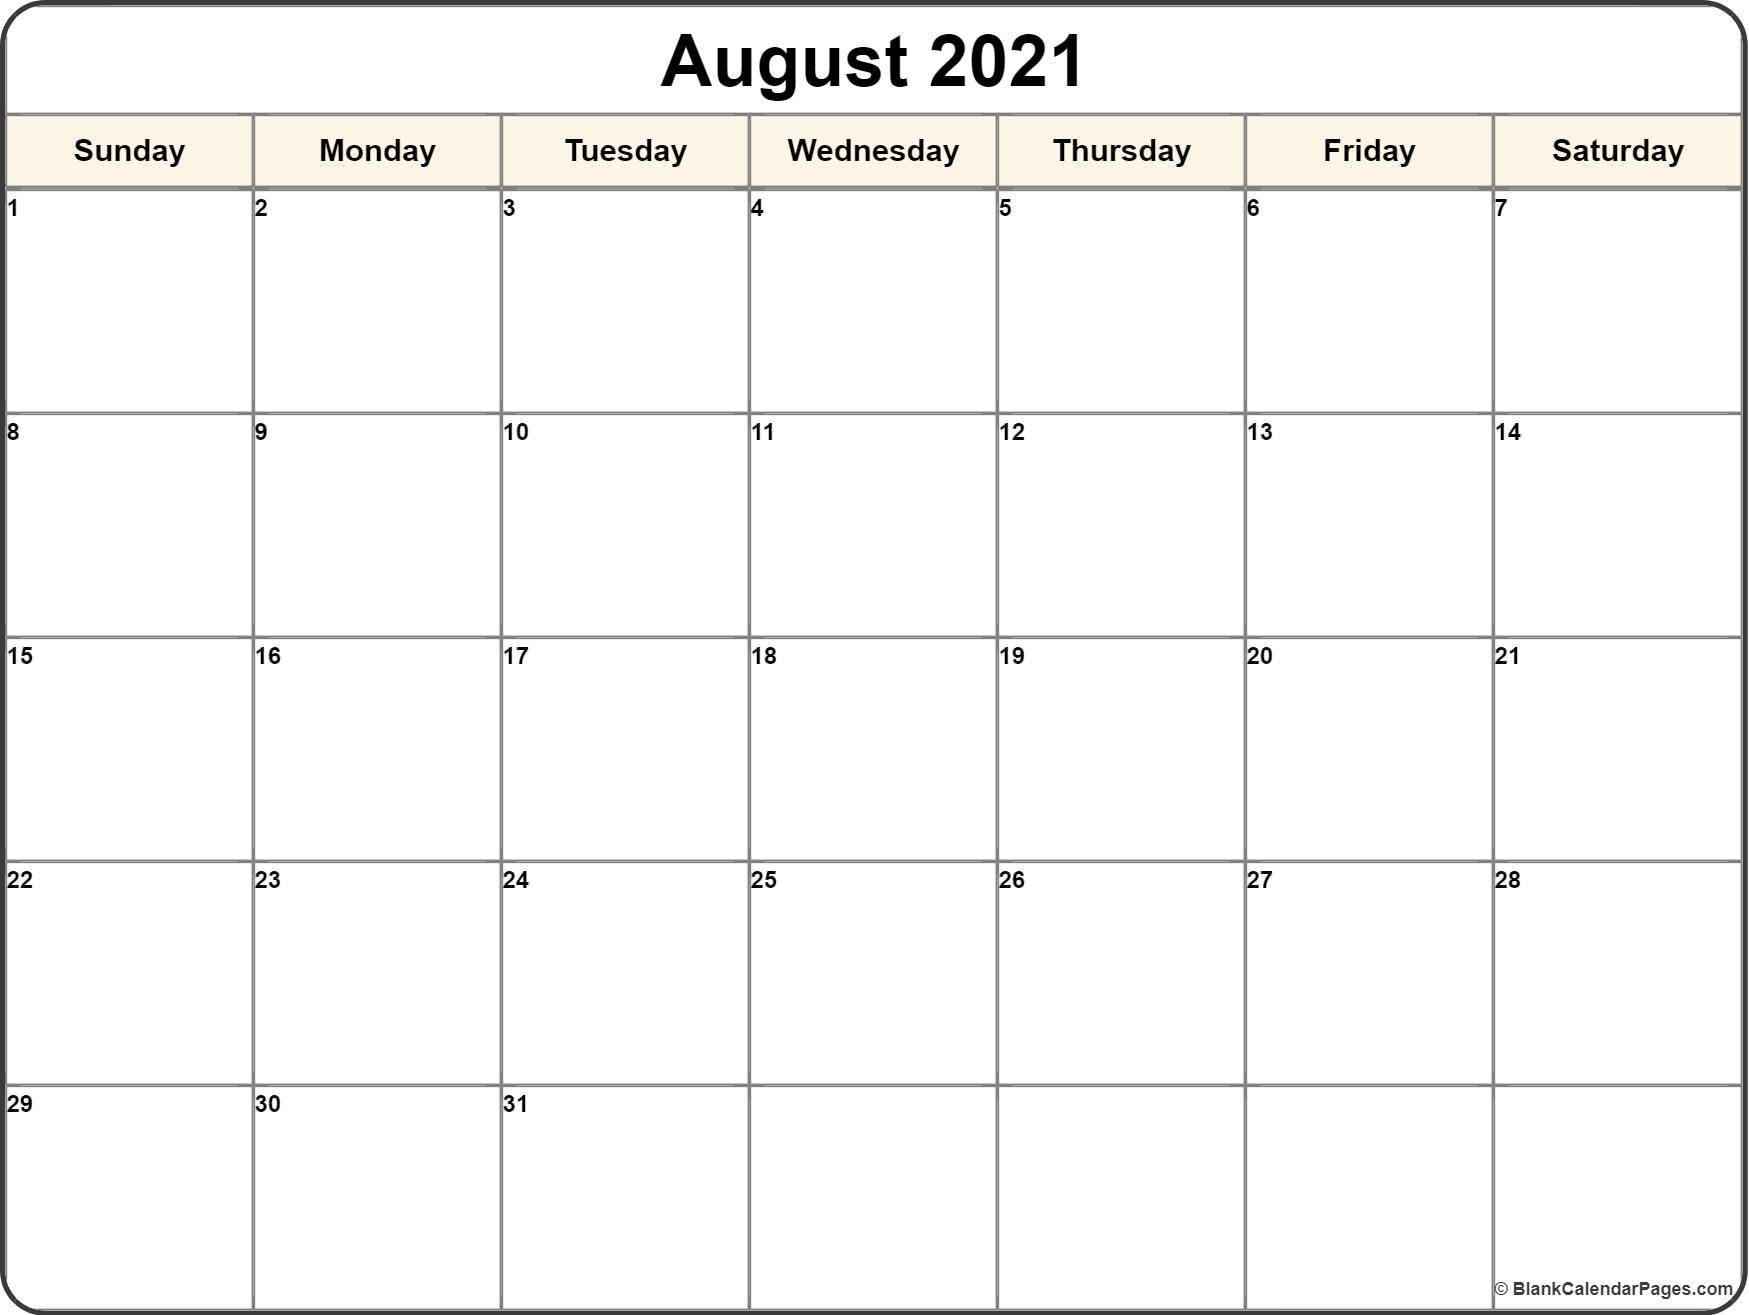 August 2021 Calendar | 56+ Templates Of 2021 Printable inside August 2021 Template Calendar